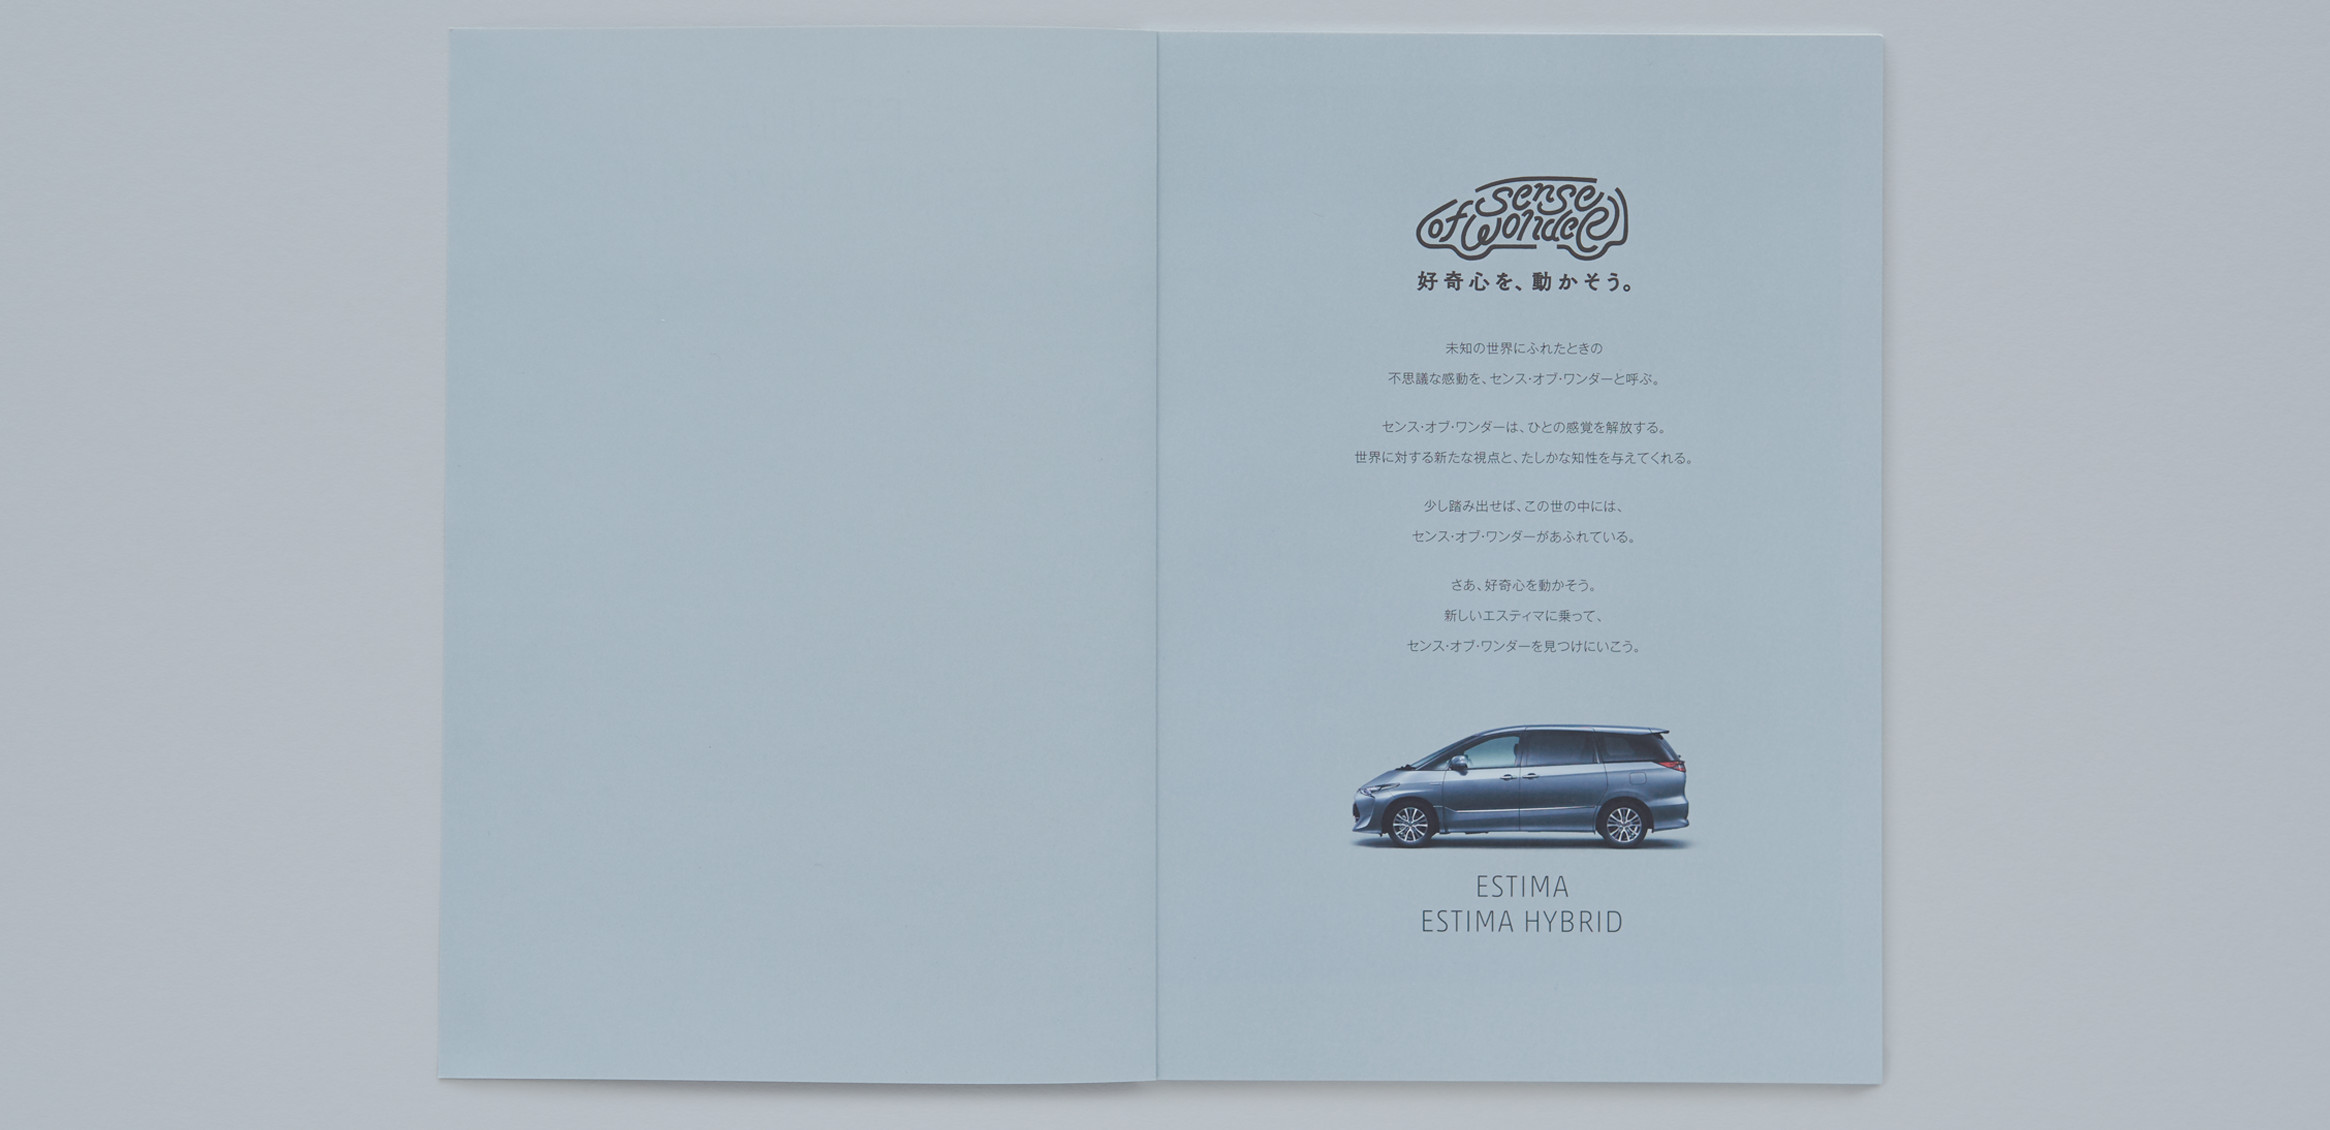 ESTIMA / ESTIMA HYBRIDカタログ 1枚目